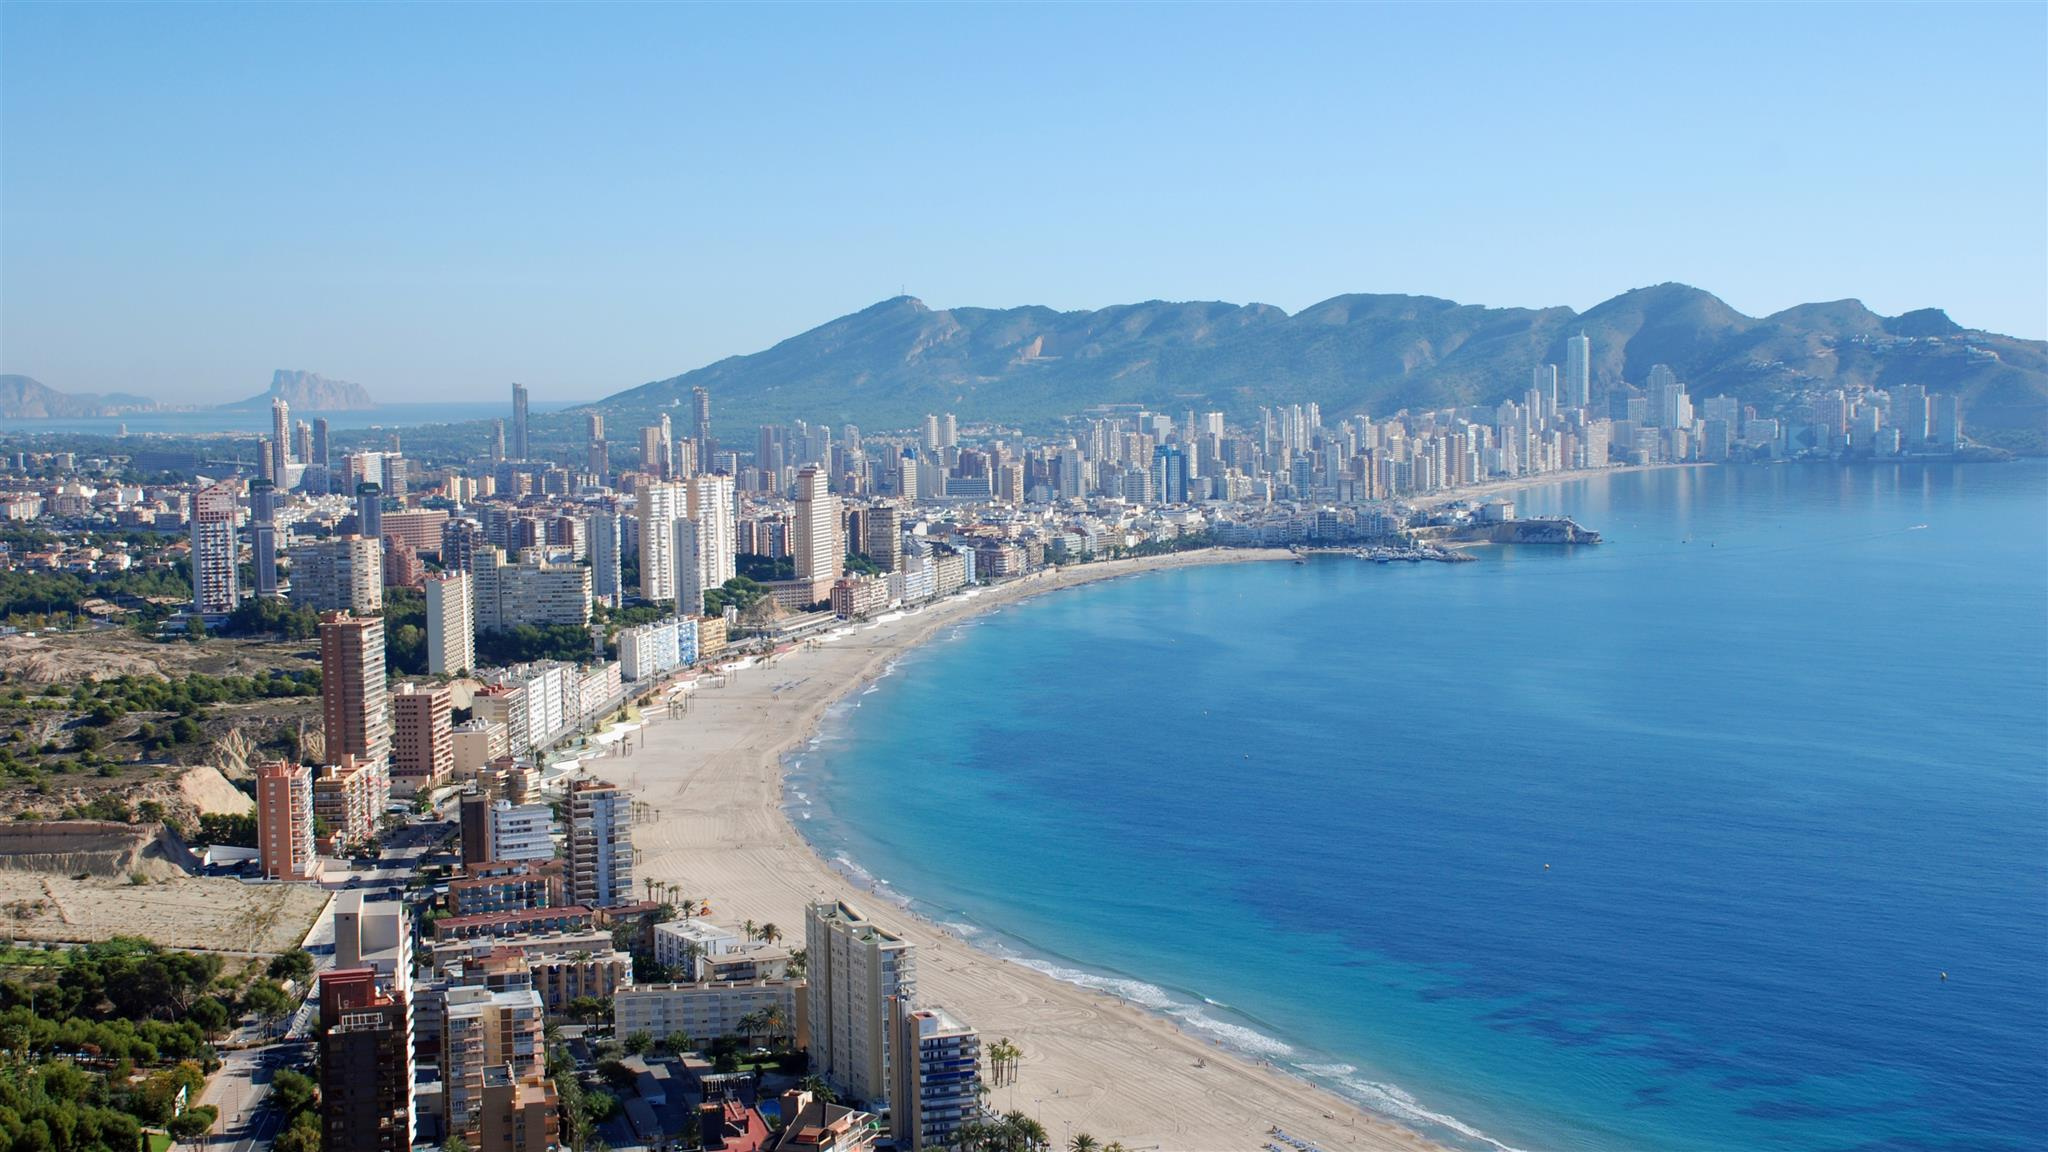 Benidorm - Costa Blanca Hotels Hd